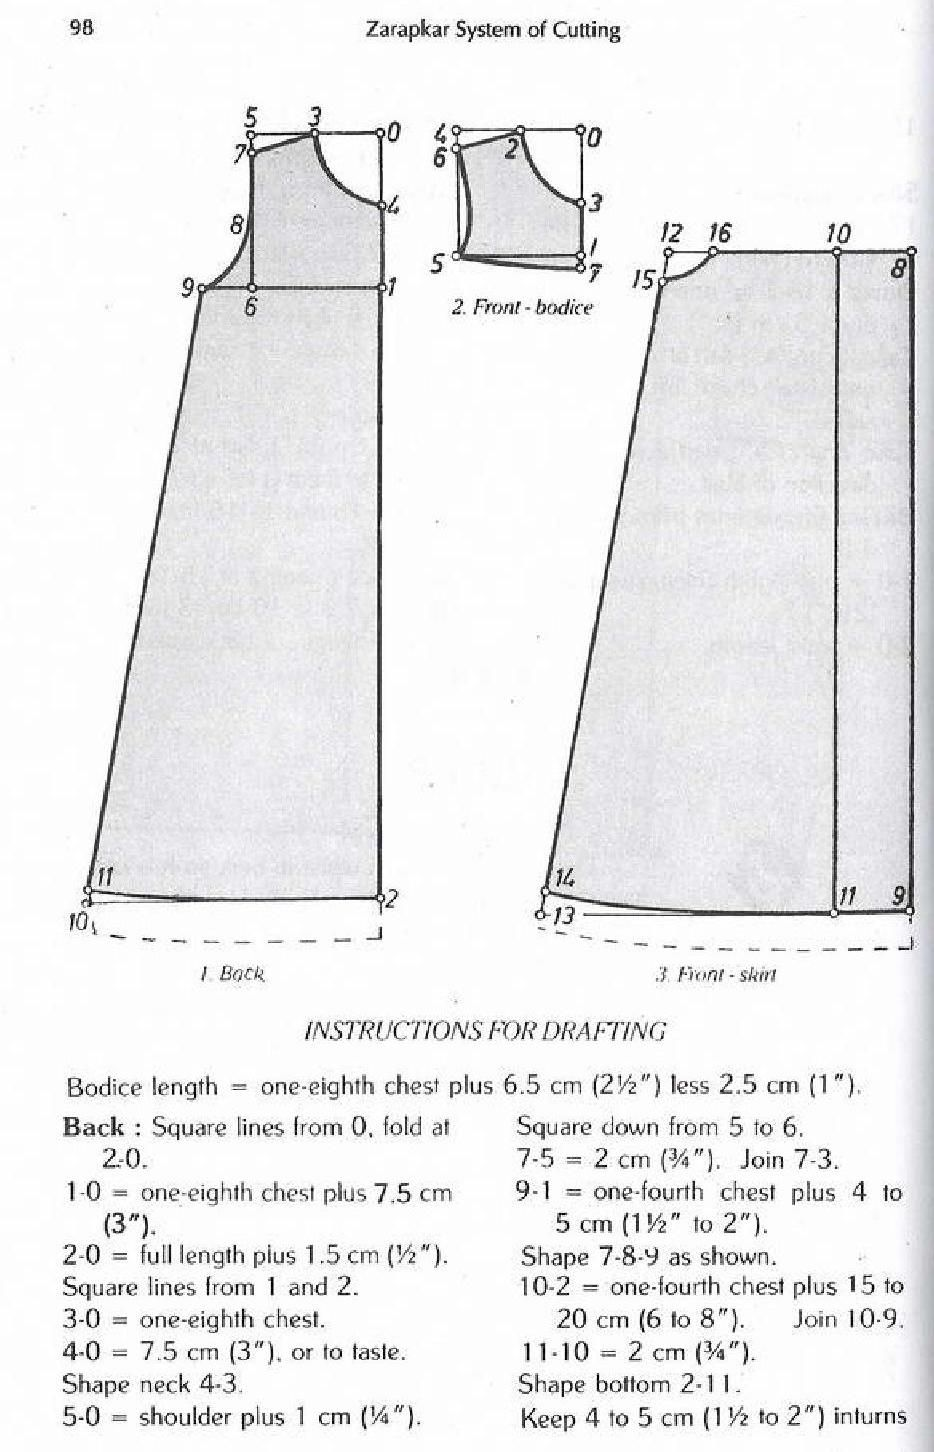 Zarapkar Tailoring Books Pdf